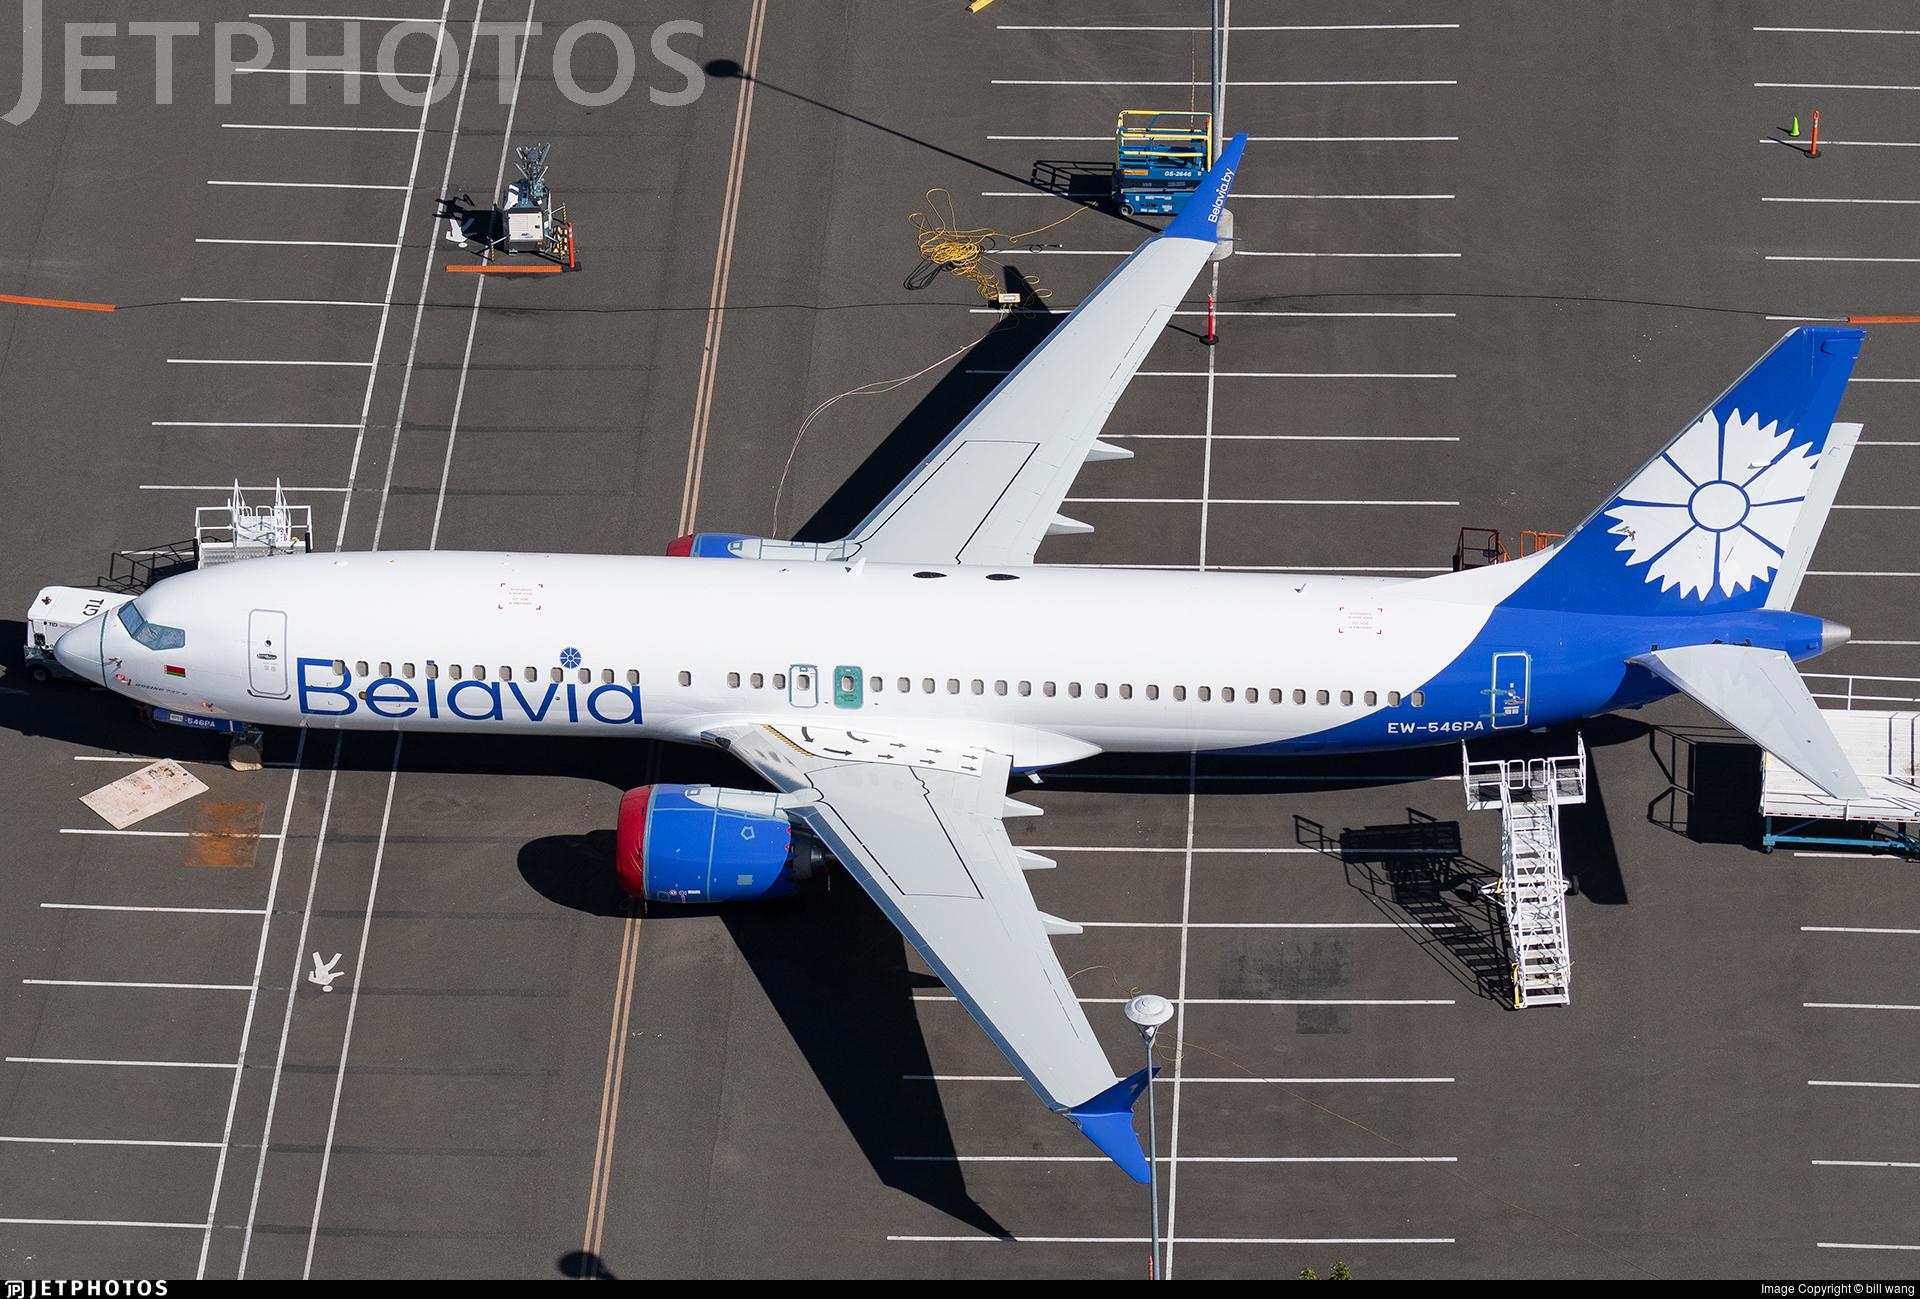 EW-546PA - Boeing 737-8 MAX - Belavia Belarusian Airlines